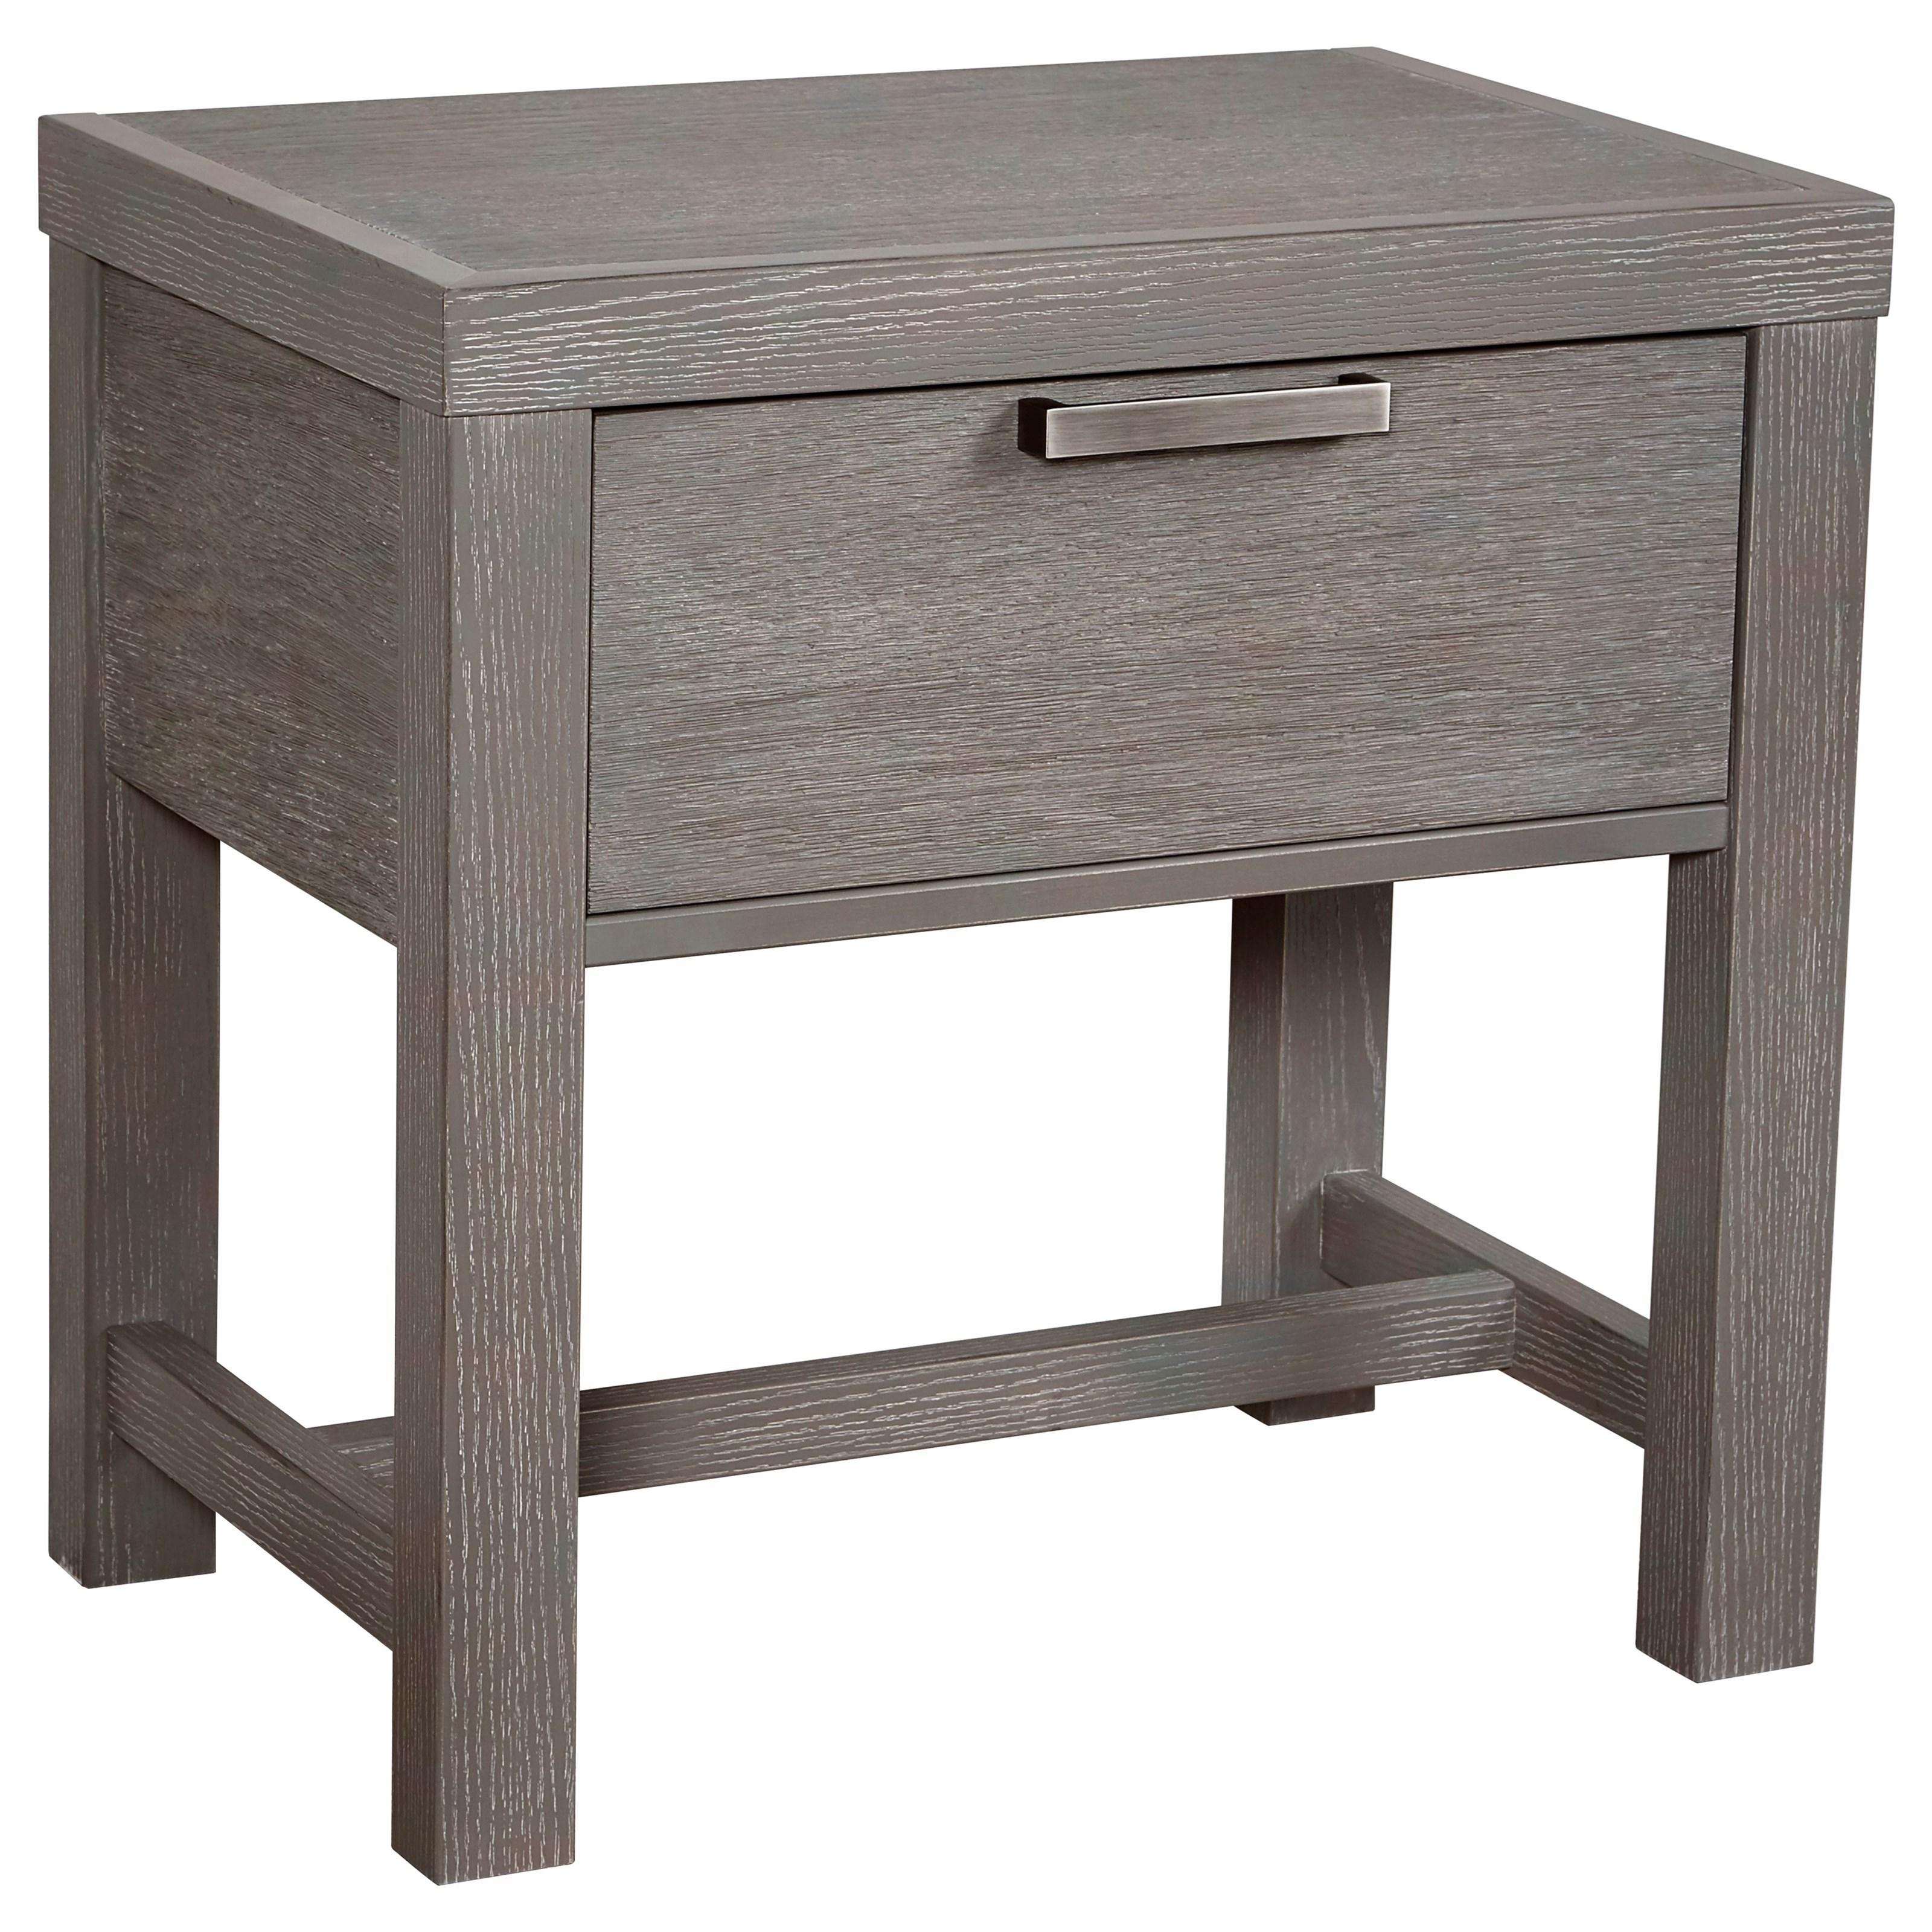 Vaughan Bassett American Modern Bedside Table - 1 Drawer w/ USB Charging - Item Number: 651-224